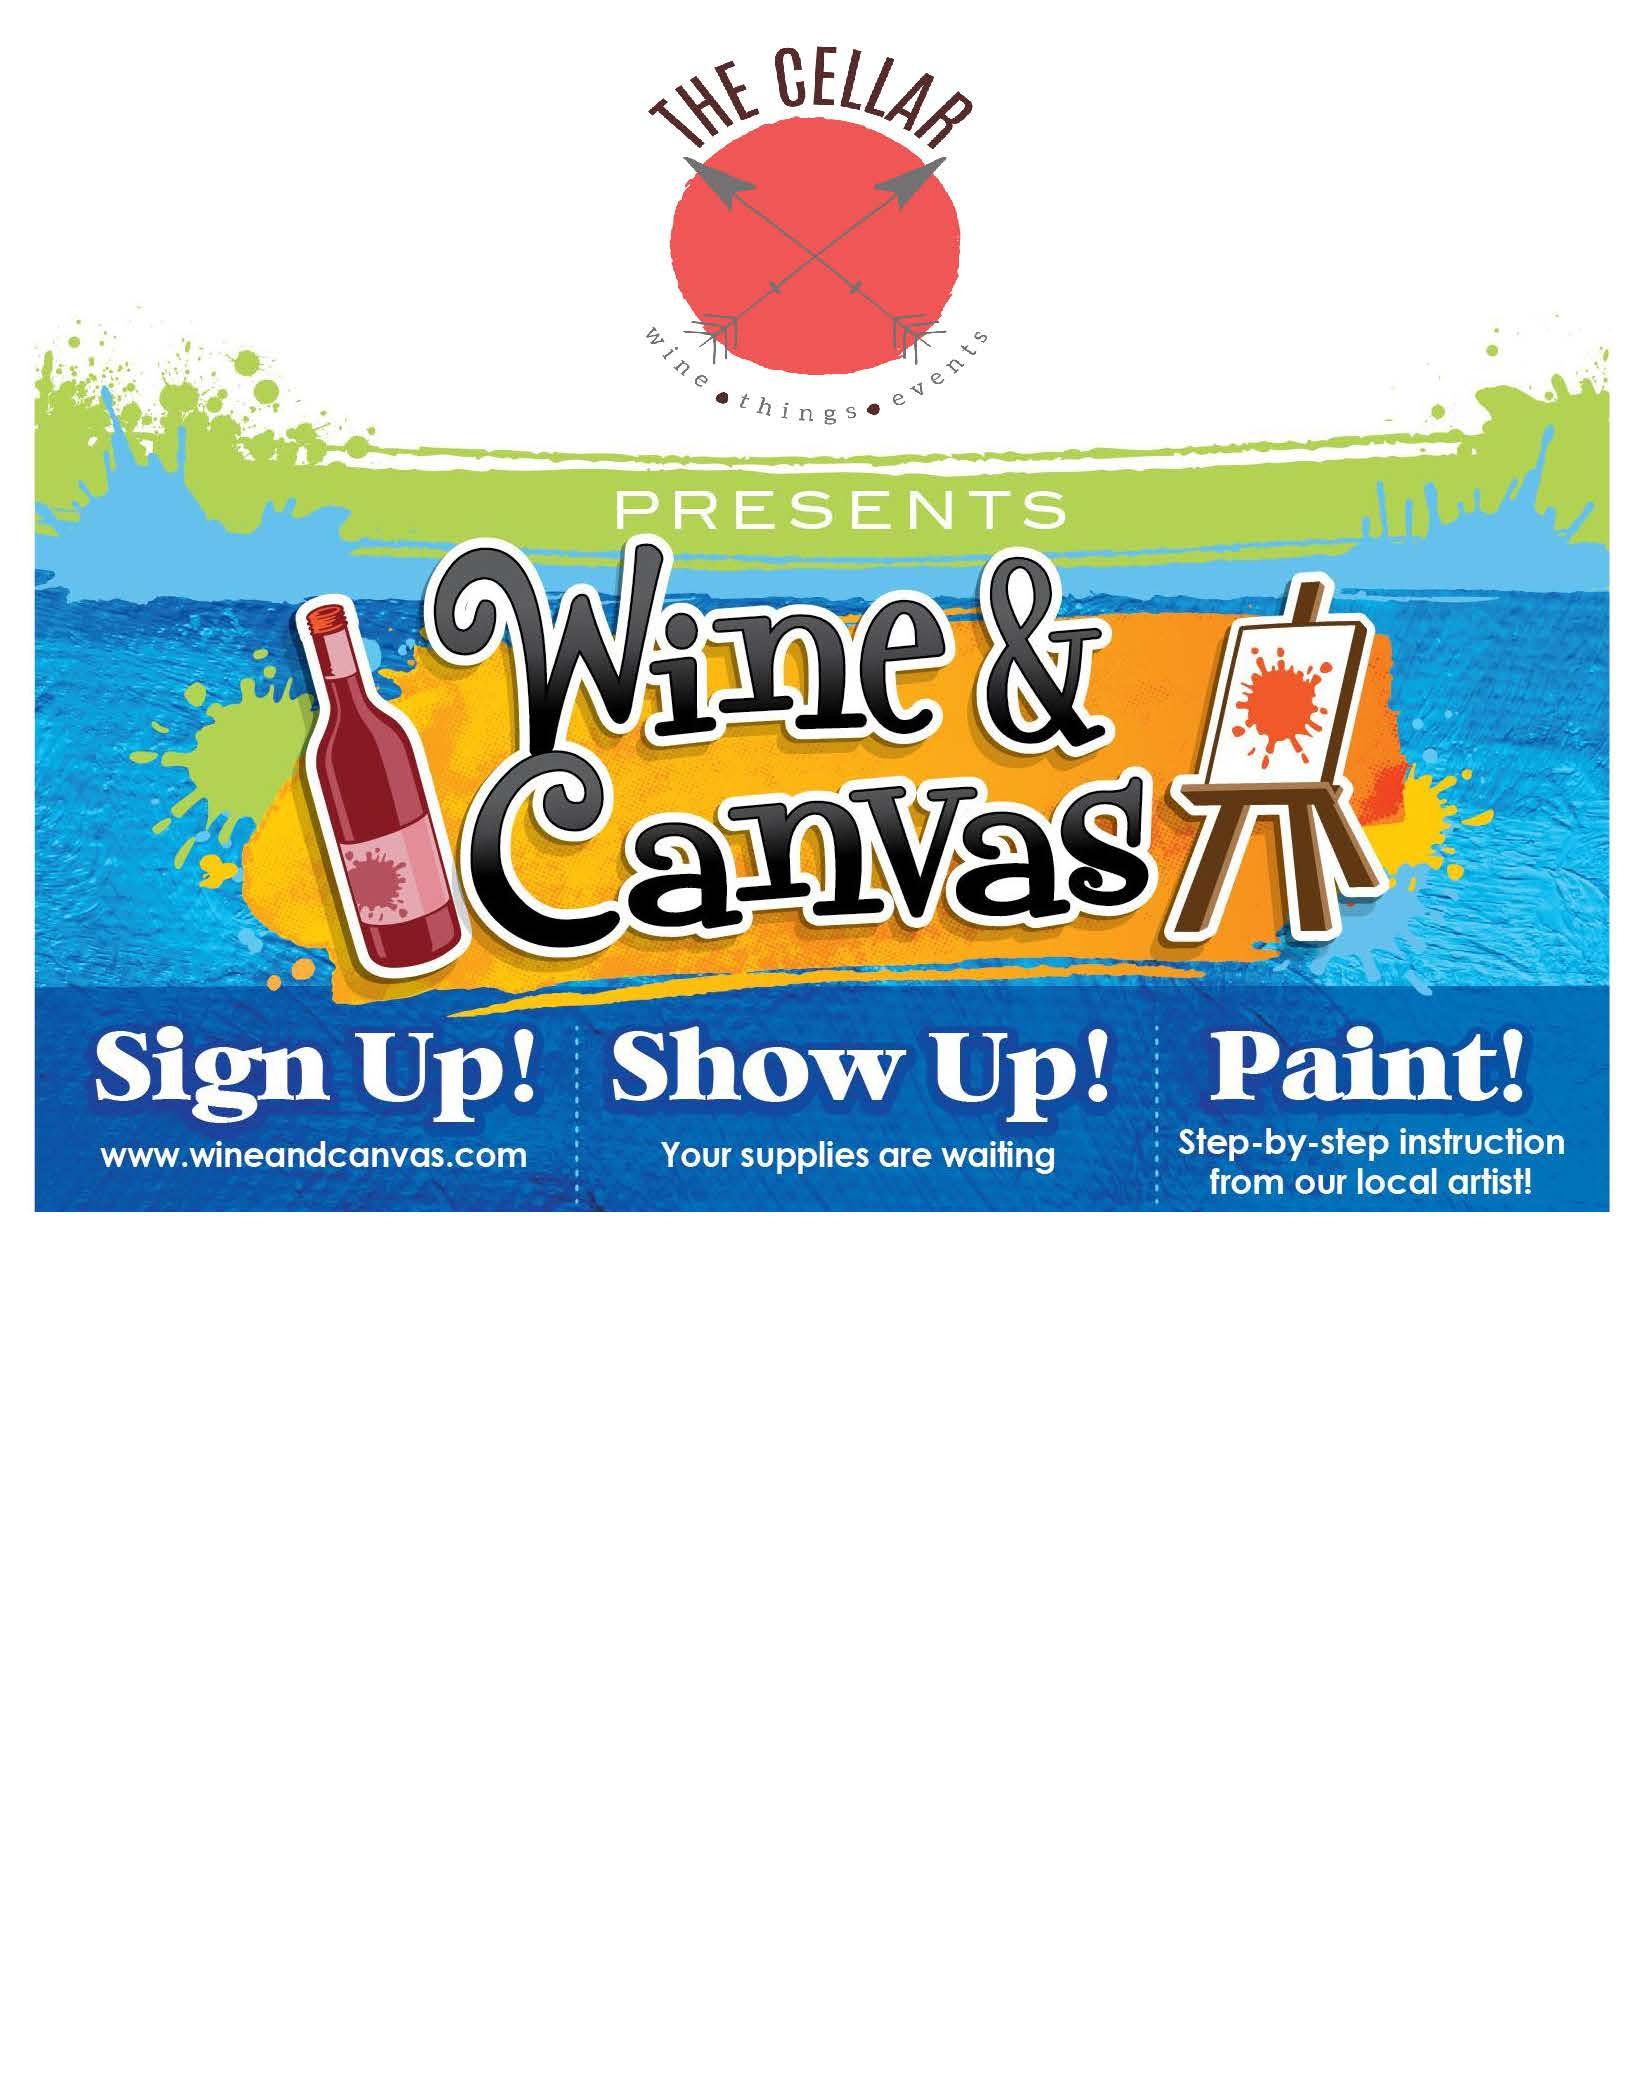 515 829 0661 or www.WineandCanvas.com